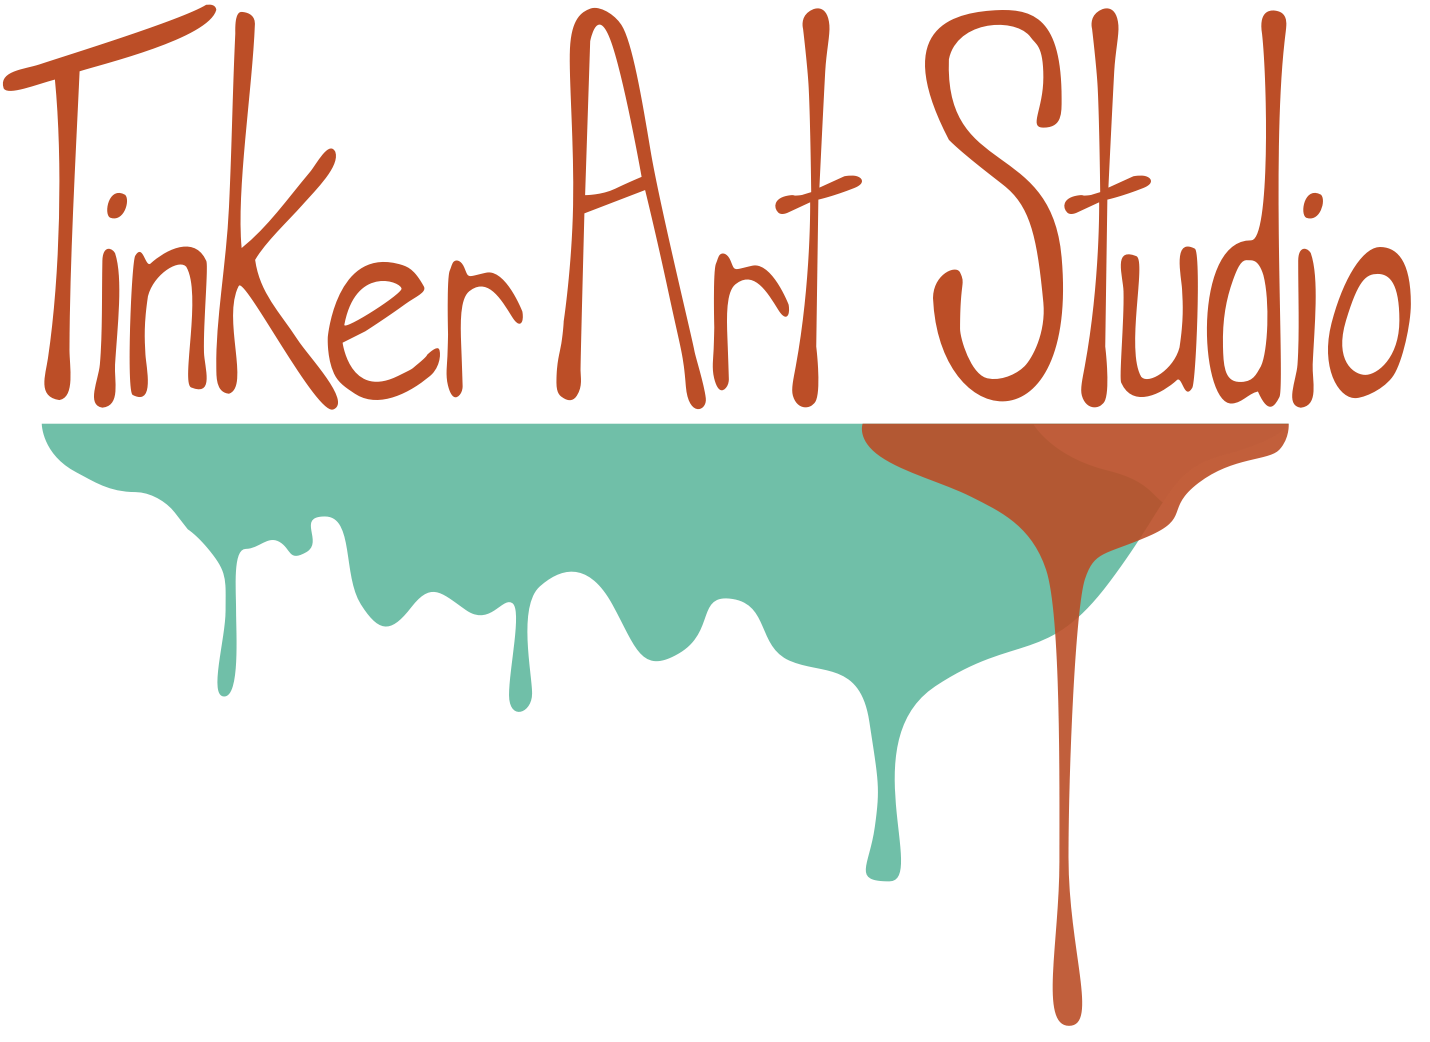 Tinker Art Studio, Boulder, CO, USA (Image)